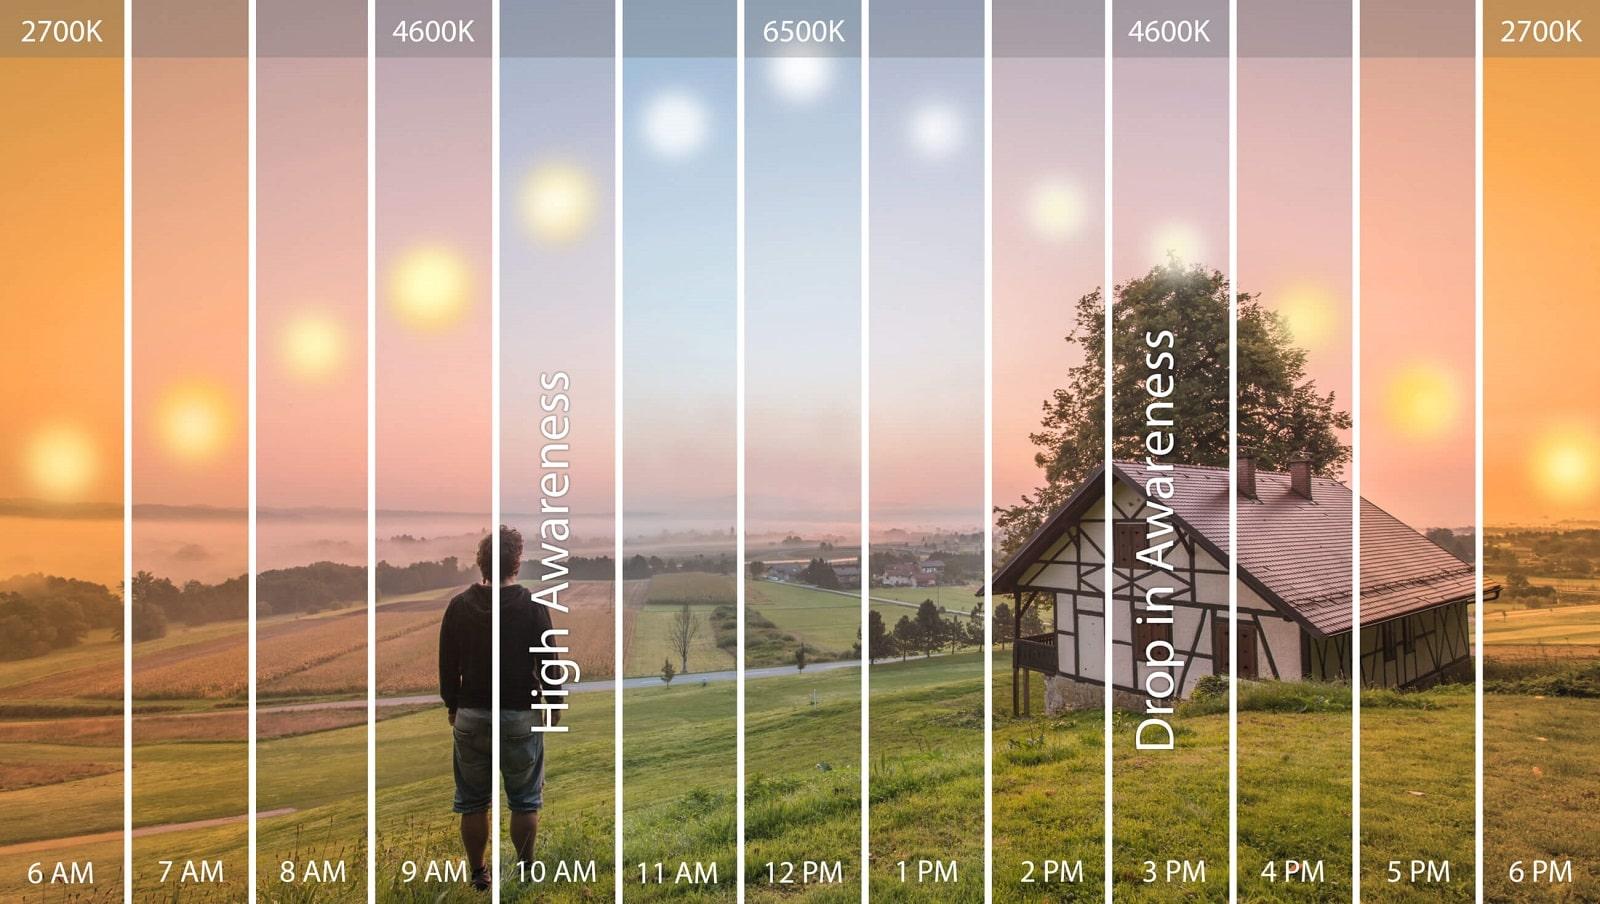 Cicardian lighting explained visually